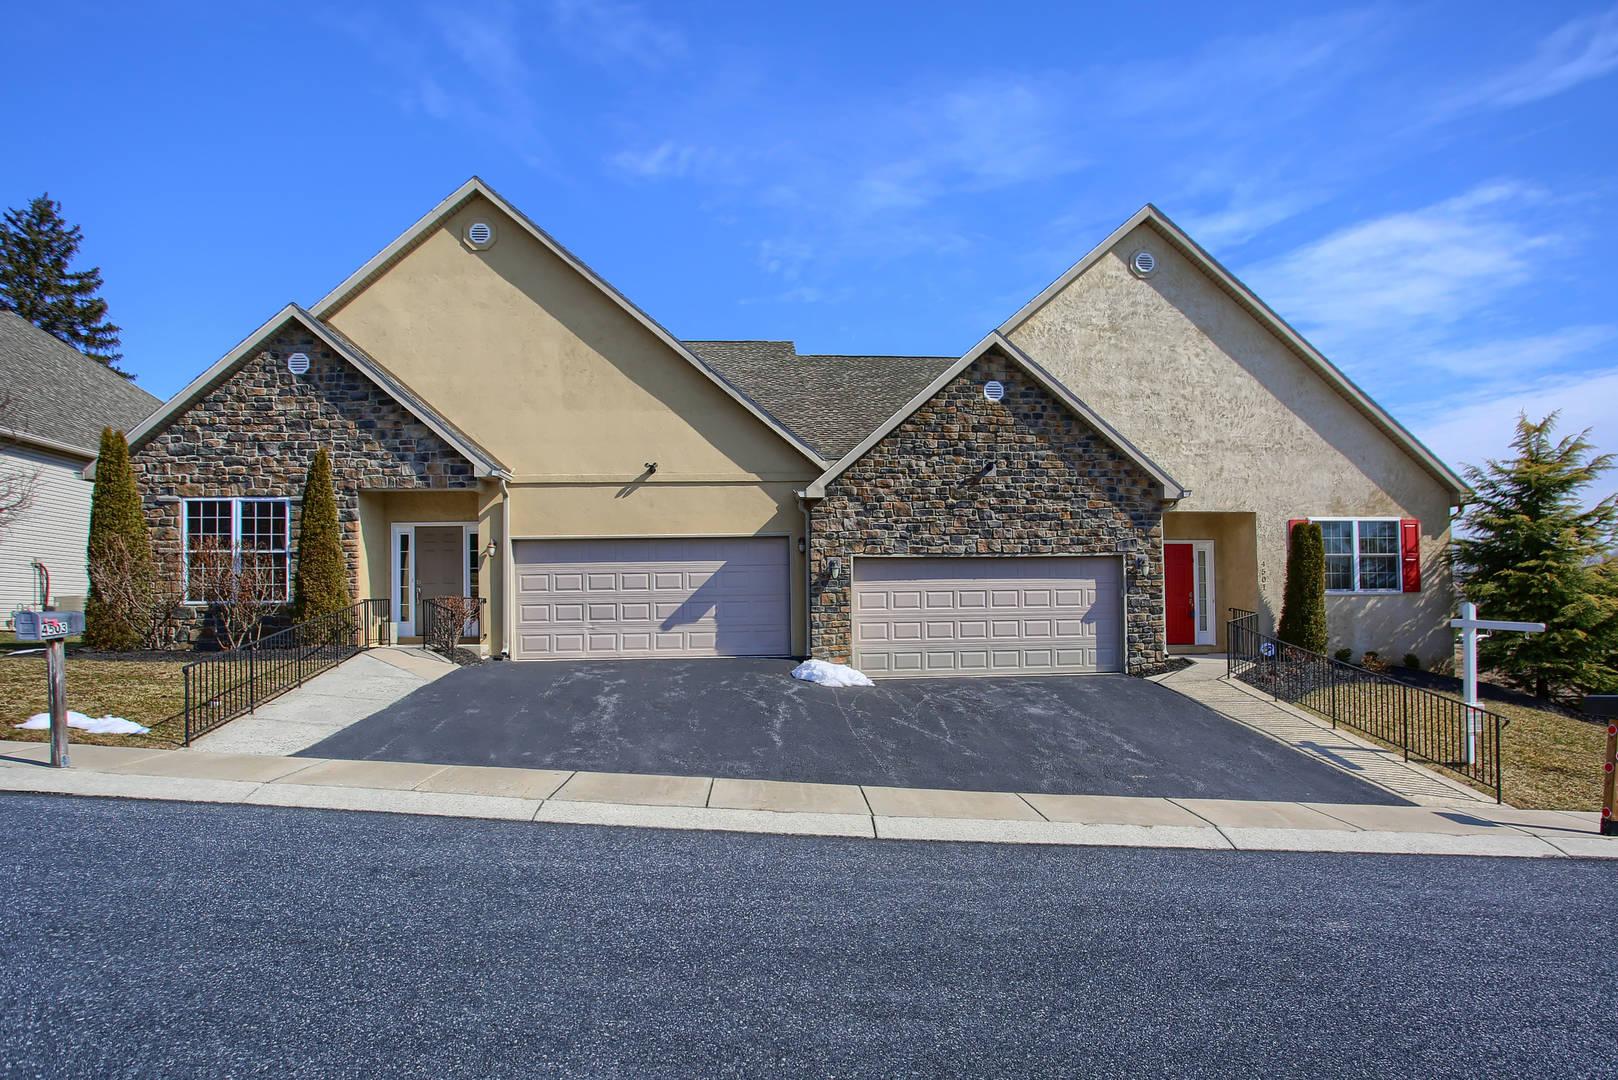 4501 Hillside Ct Harrisburg, PA 17110